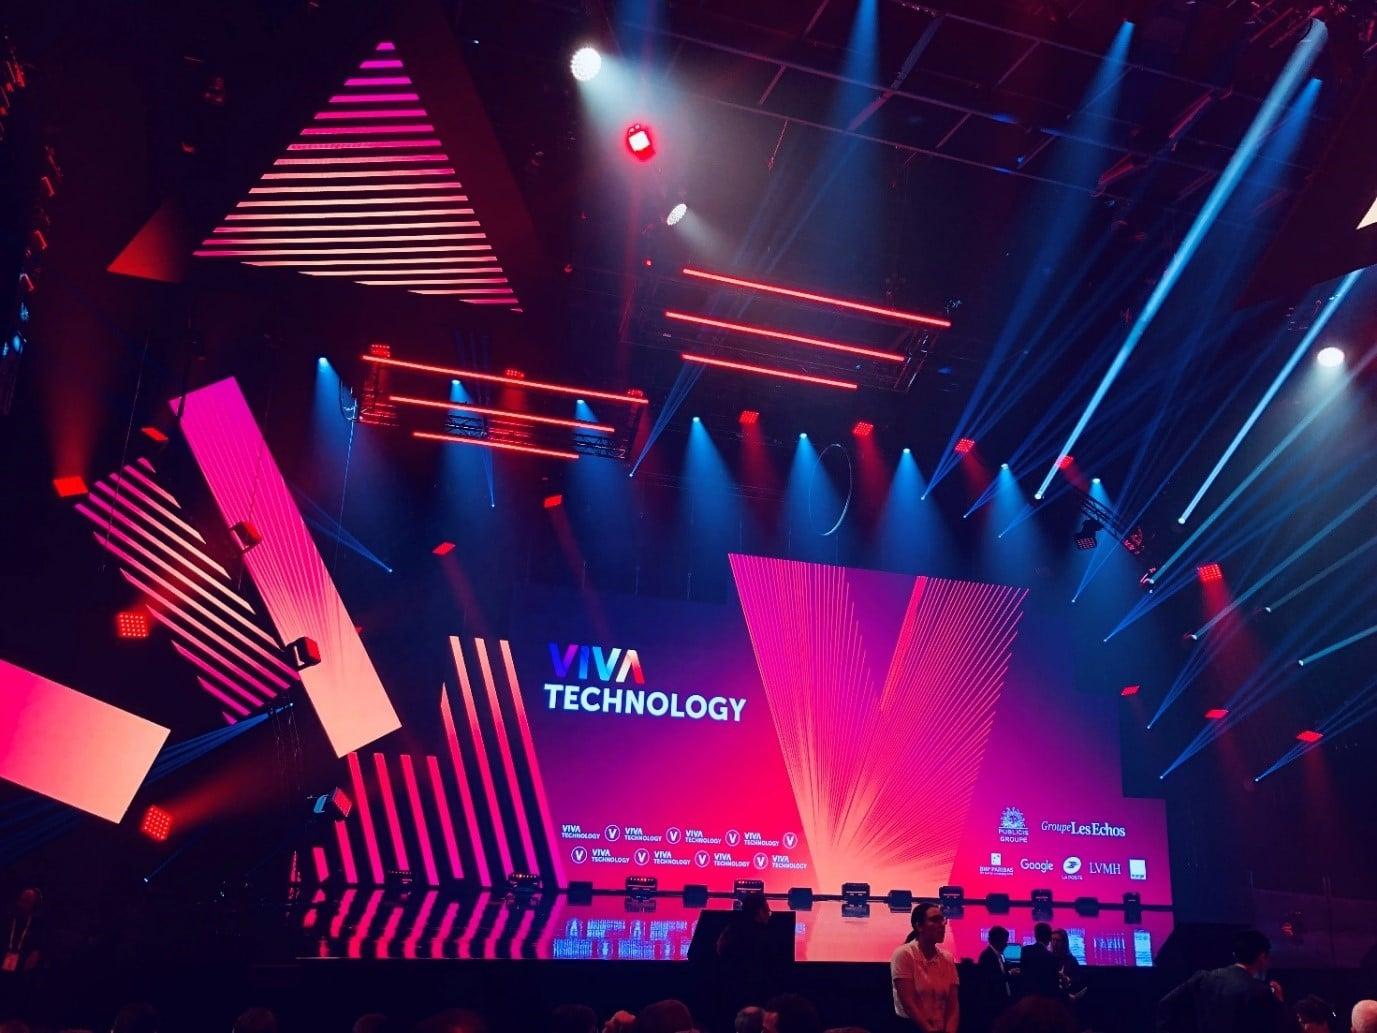 Viva Technology 2019 in Paris